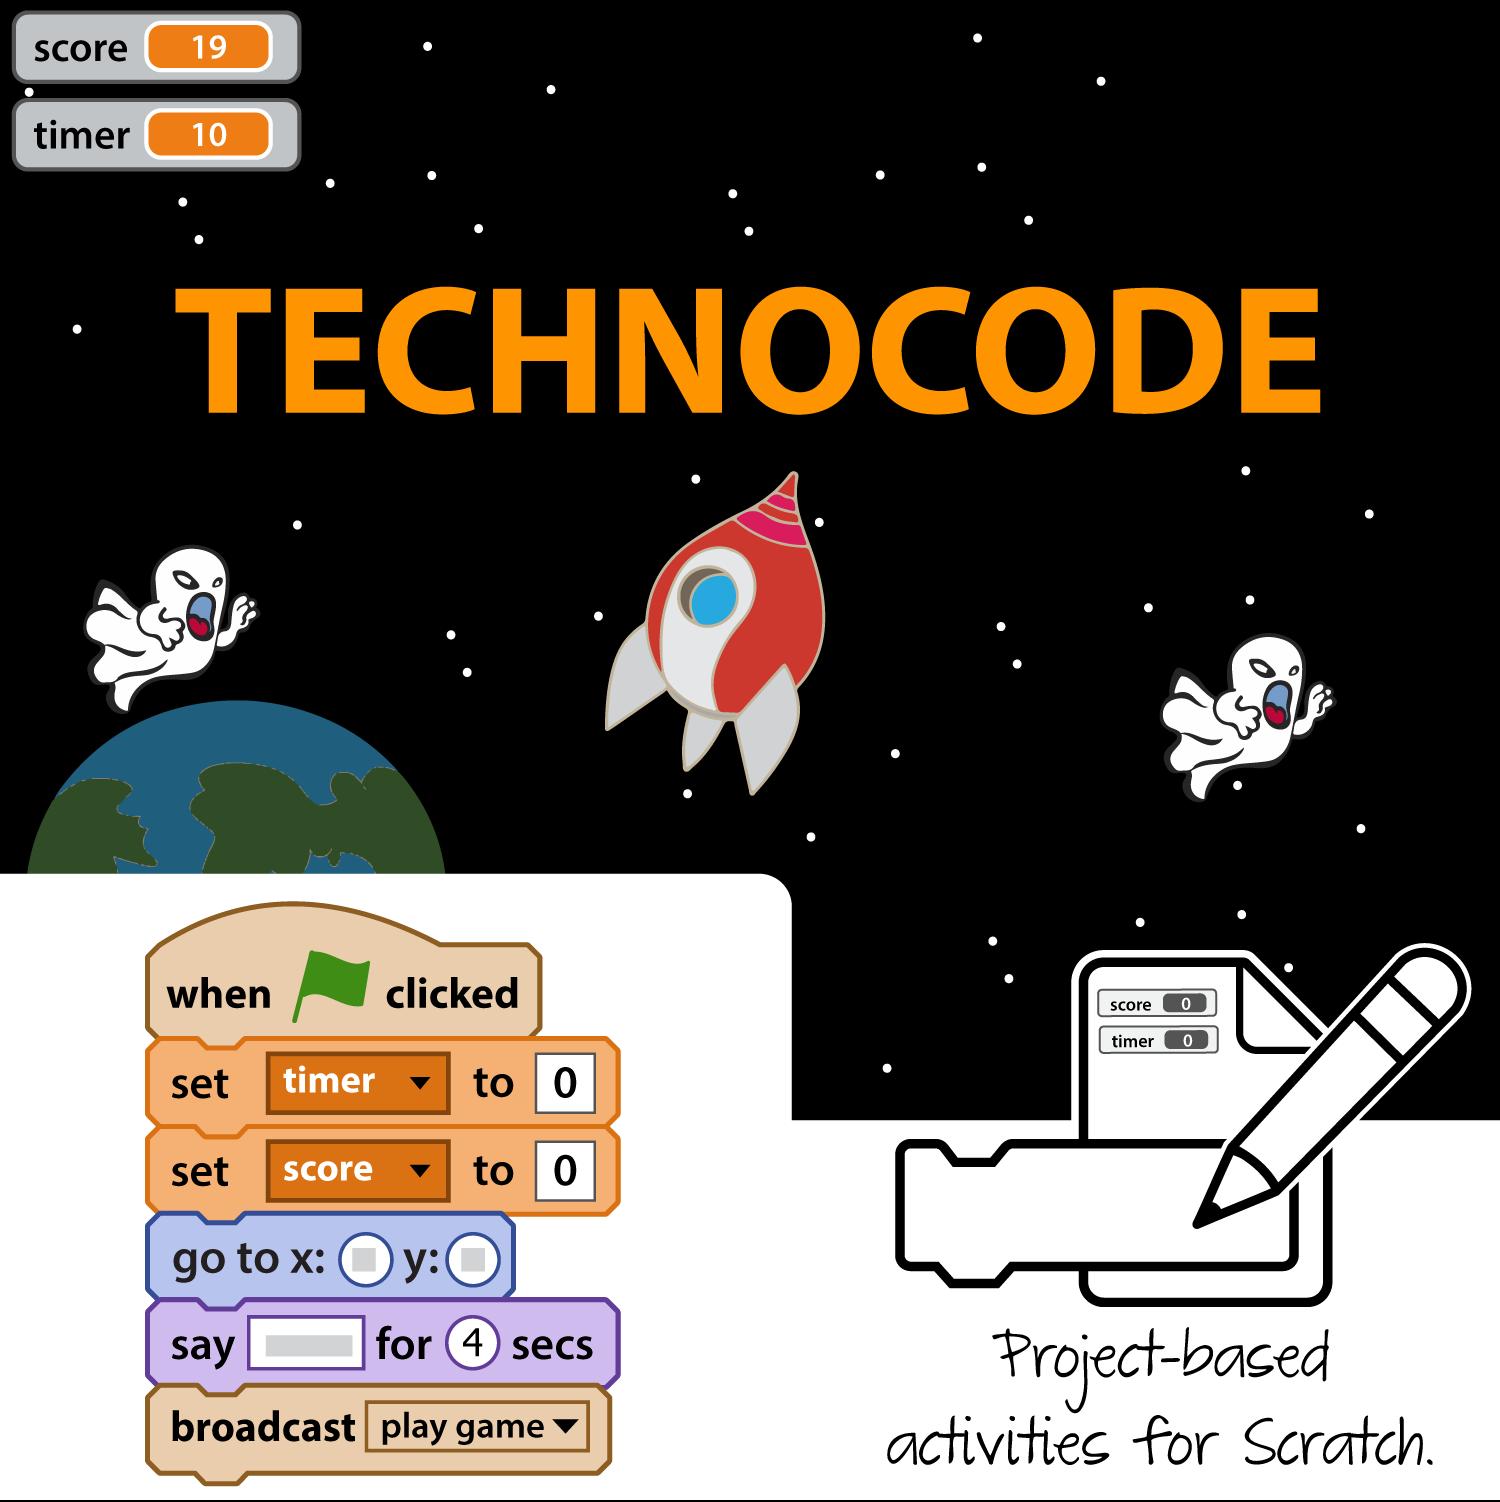 TechnoCode Coding lessons, Stem education activities